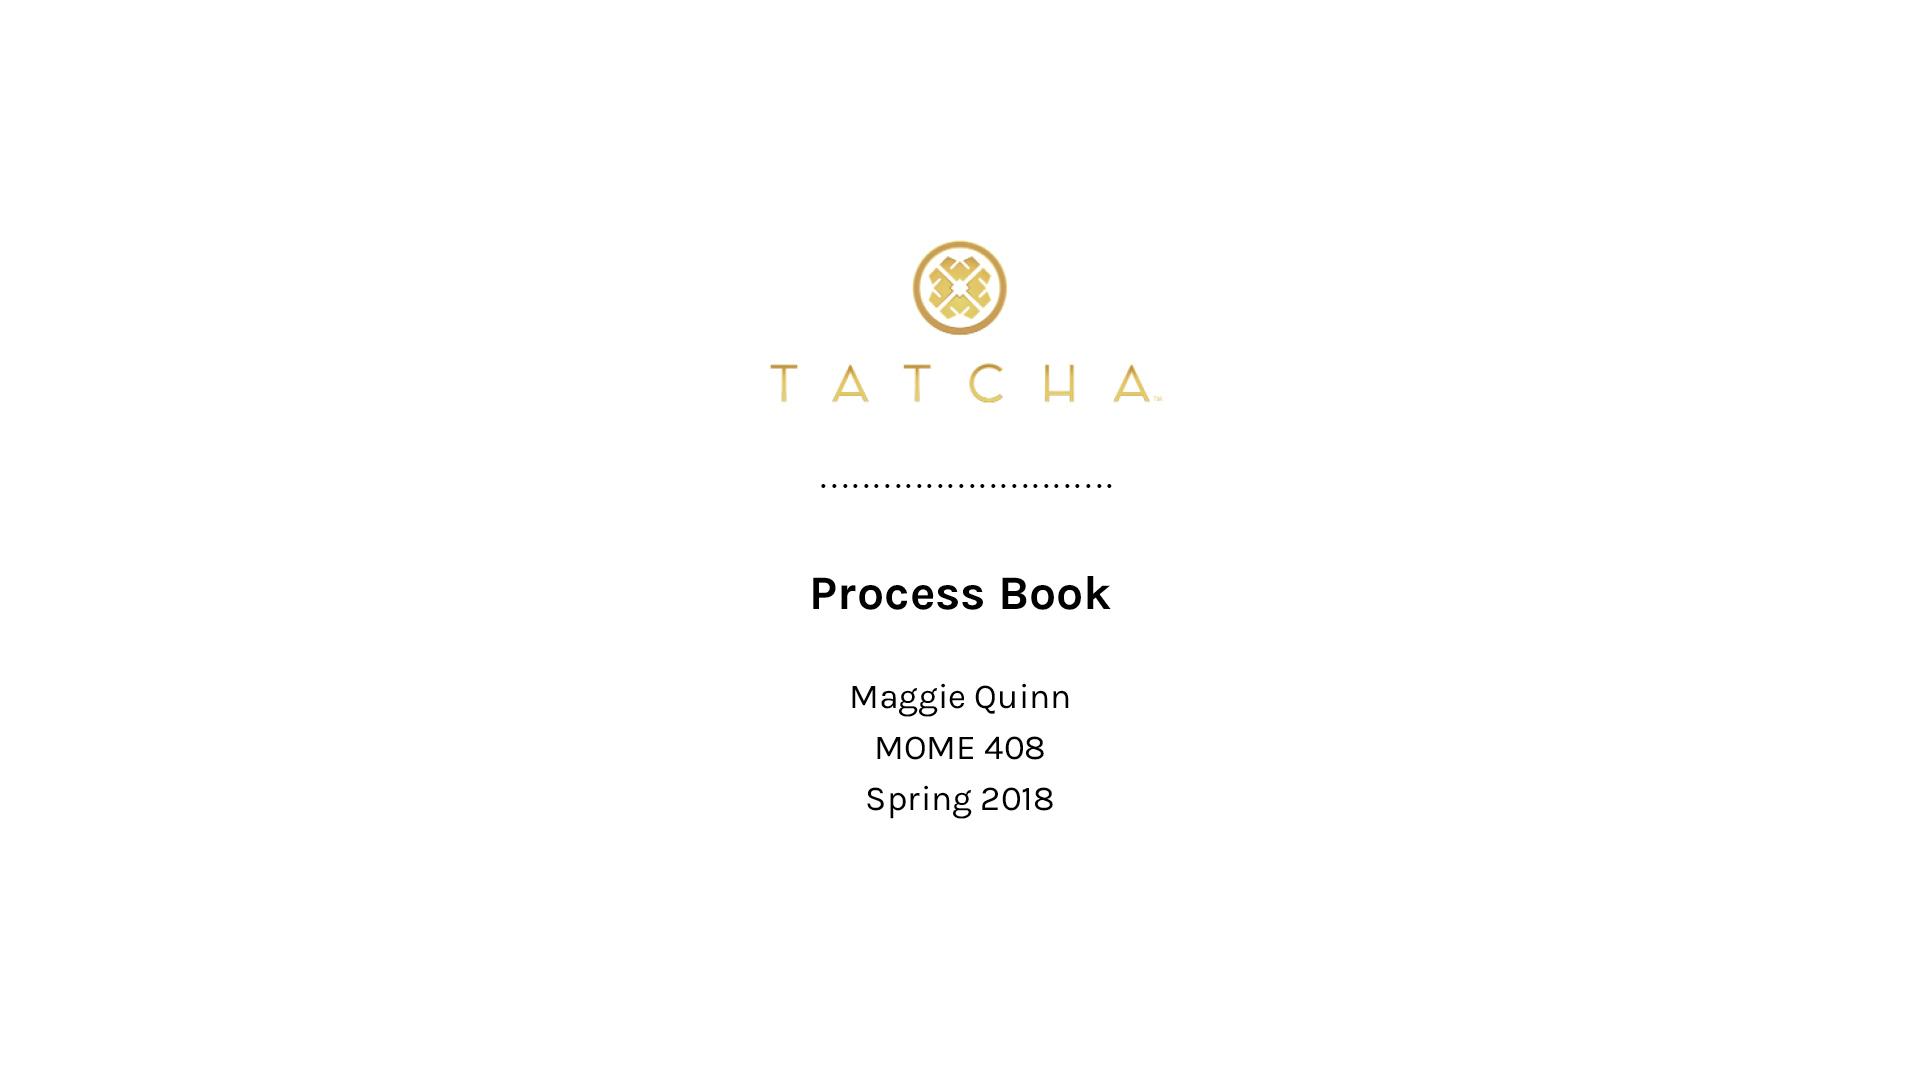 Tatcha Process Book.jpg